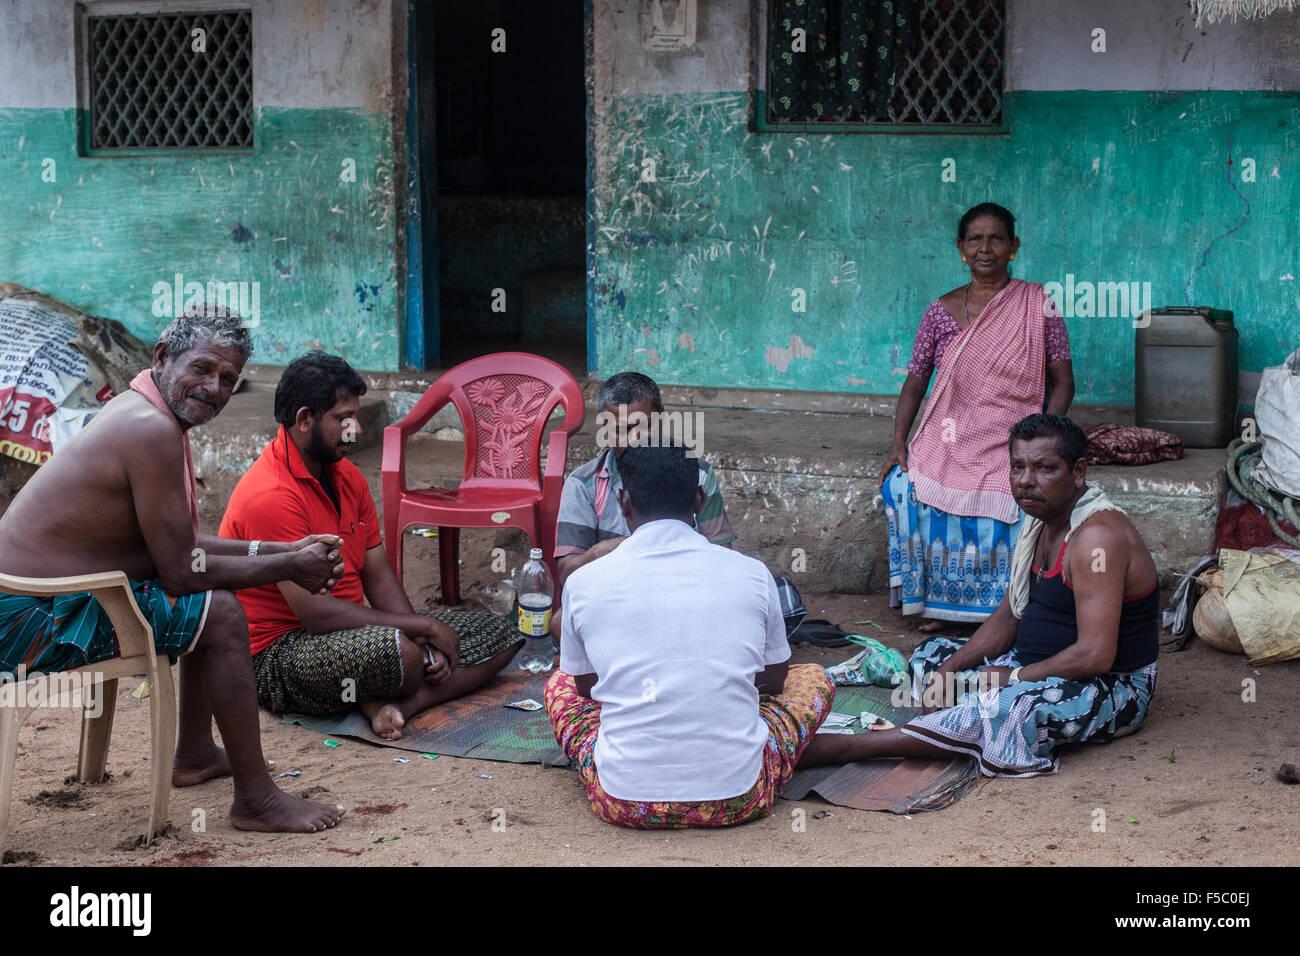 Vizhinjam Christian fisherman village in Kerala, India, November 2014. Fisherman relax with card game after hard - Stock Image